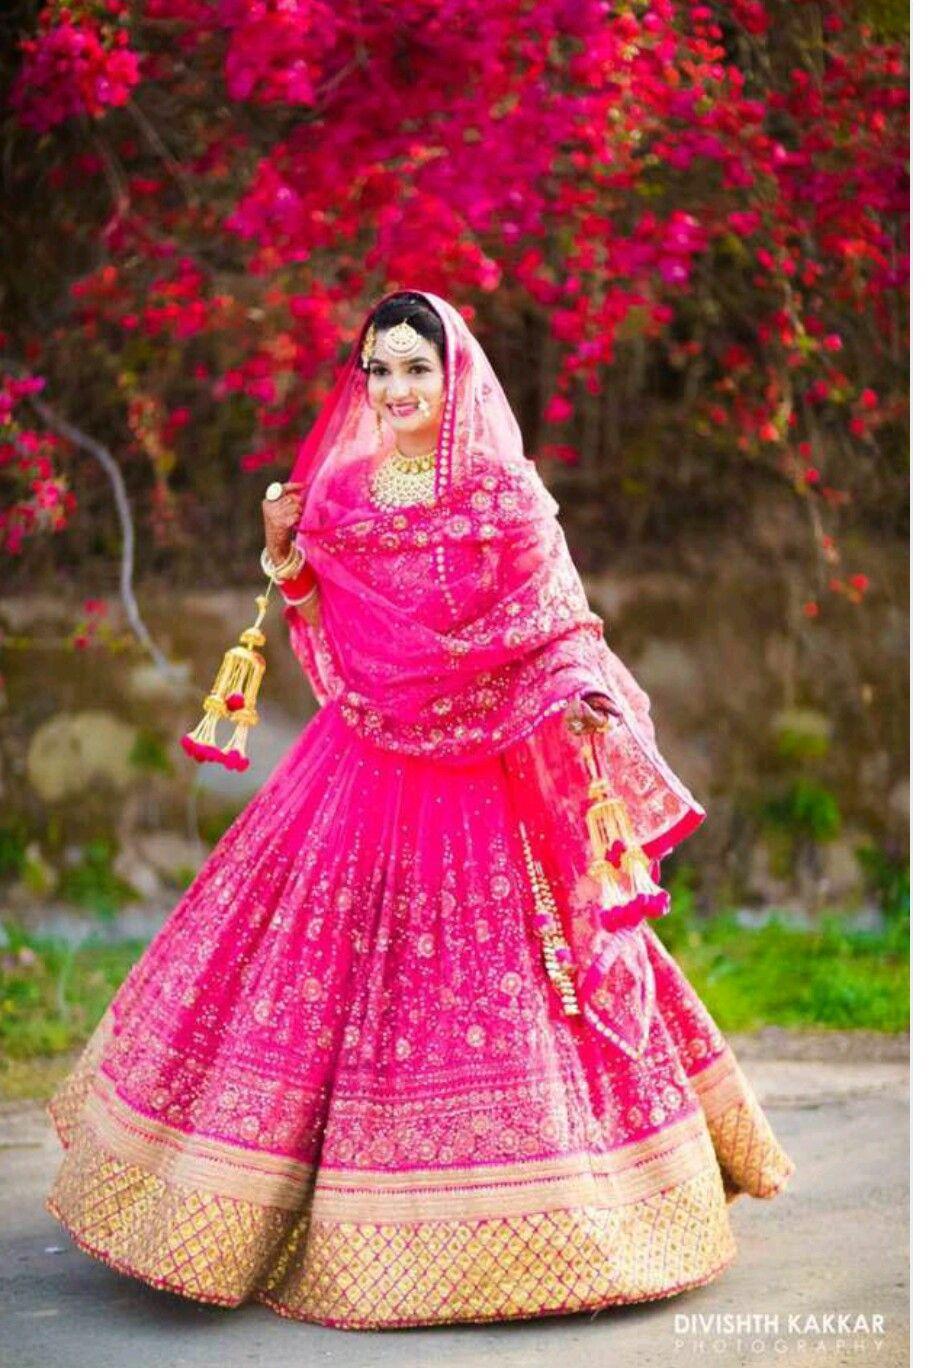 Pin de ankita agrawal en Indian bride | Pinterest